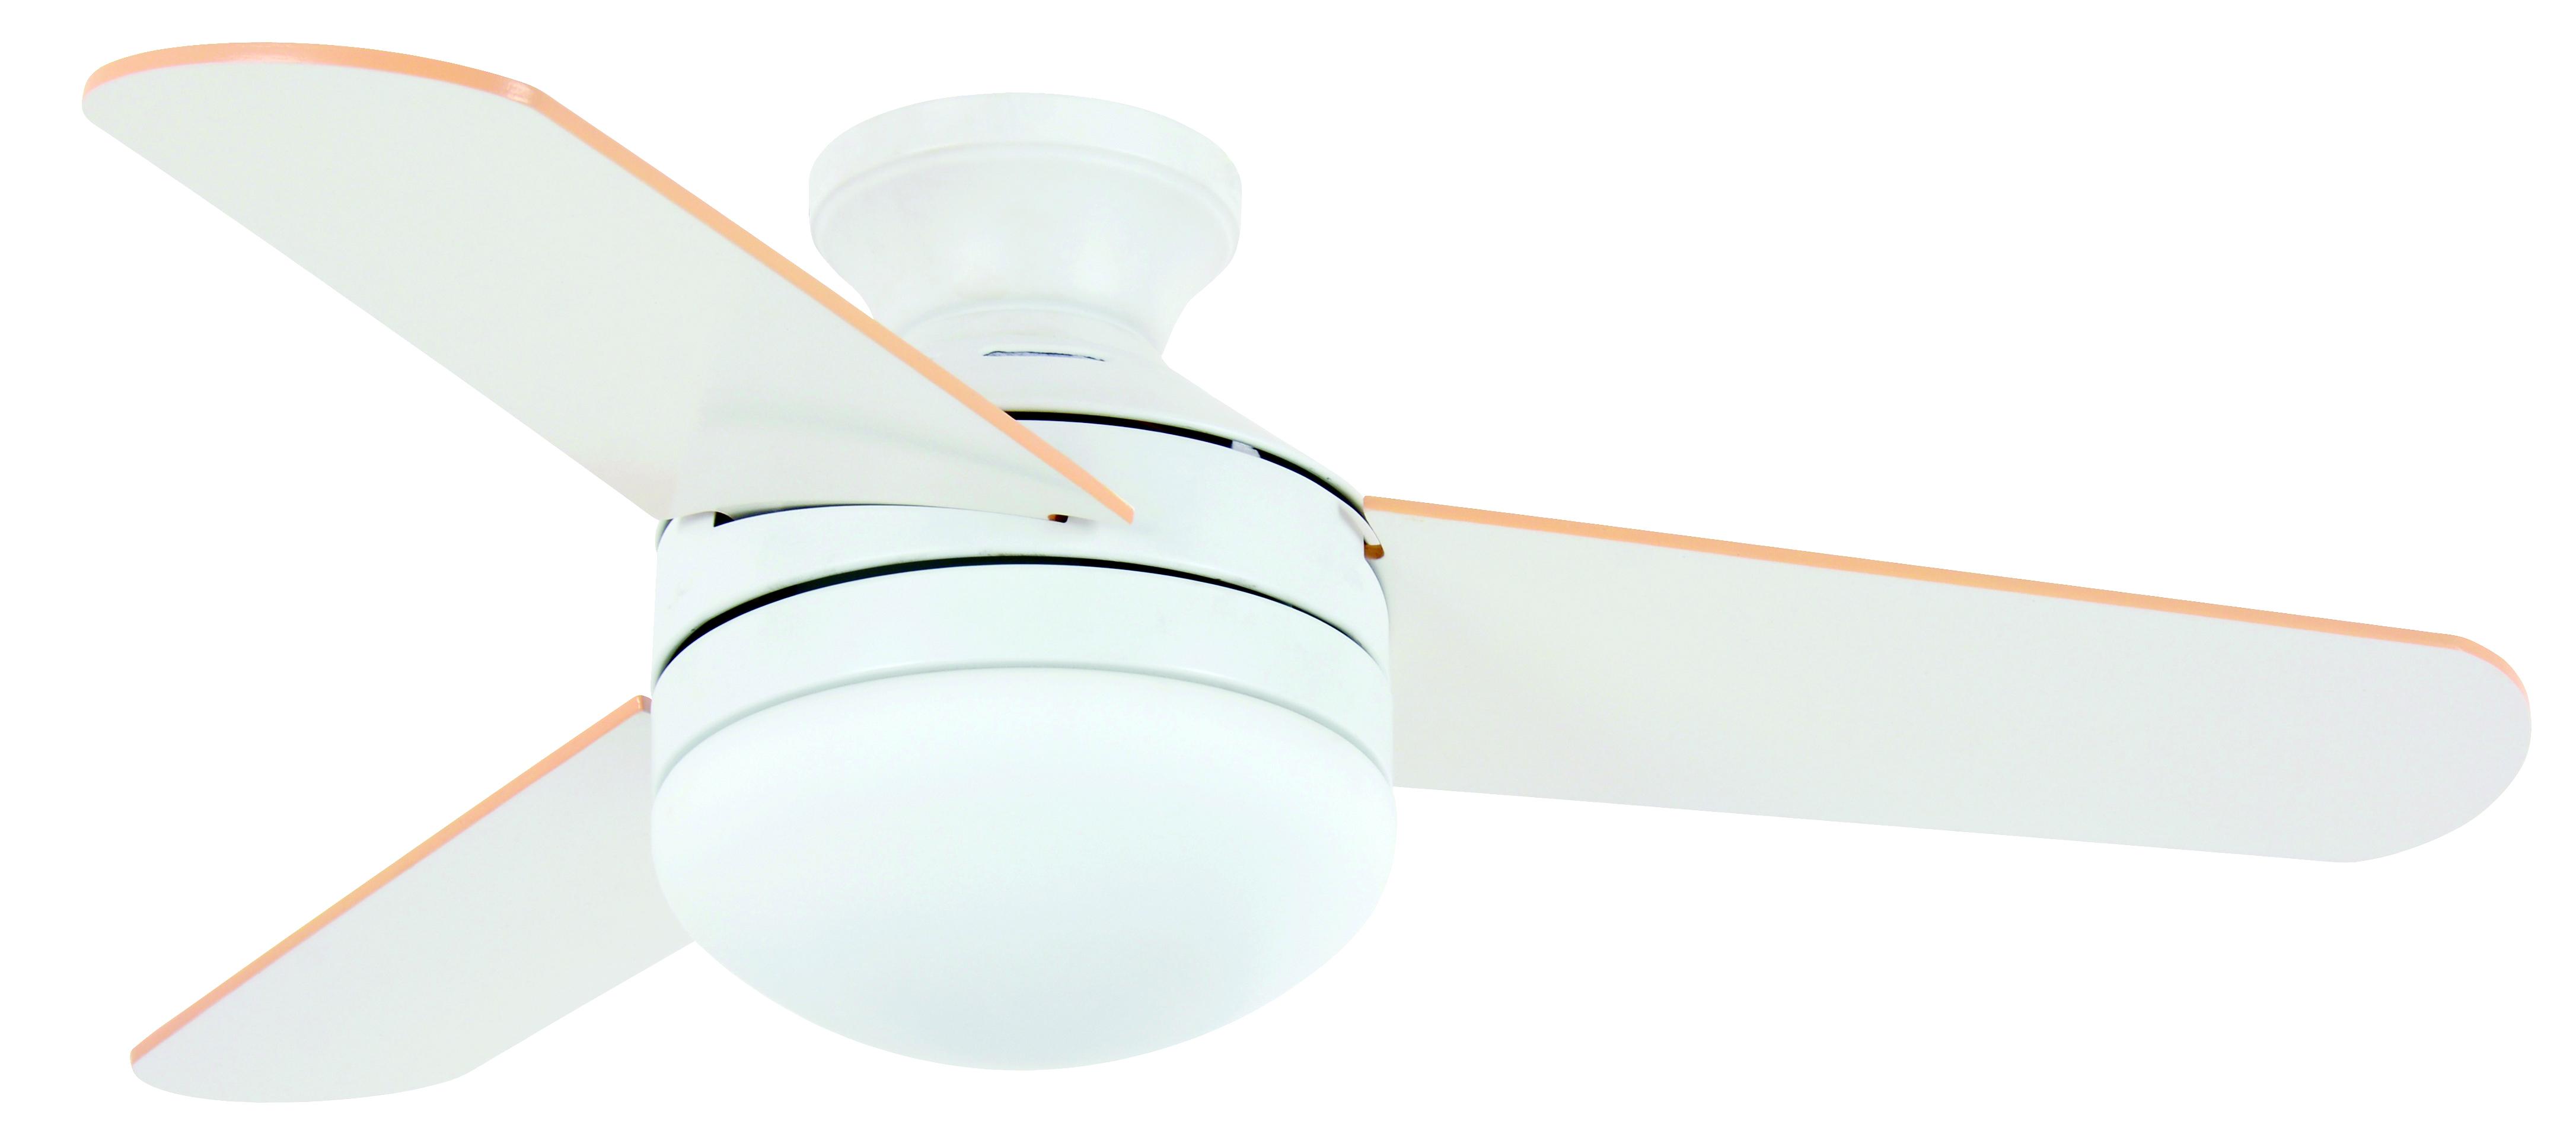 Ɯ�新發売!香港低樓底風扇燈 Lucci Air Girona Ǵ�綠燈燈飾開倉 Trilight Zone